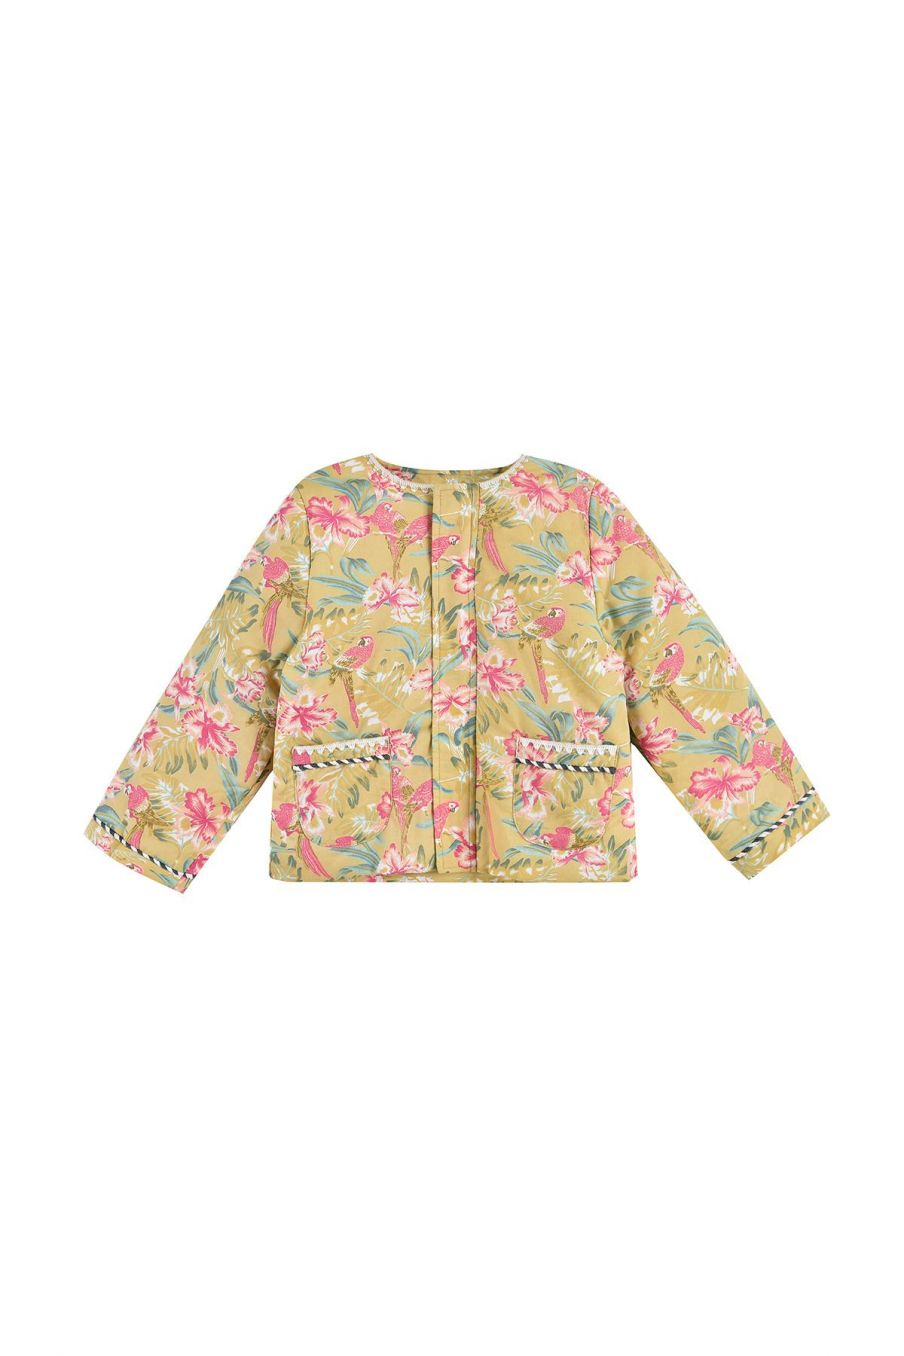 bohemian chic vintage jacket girl soluta soft honey parrots